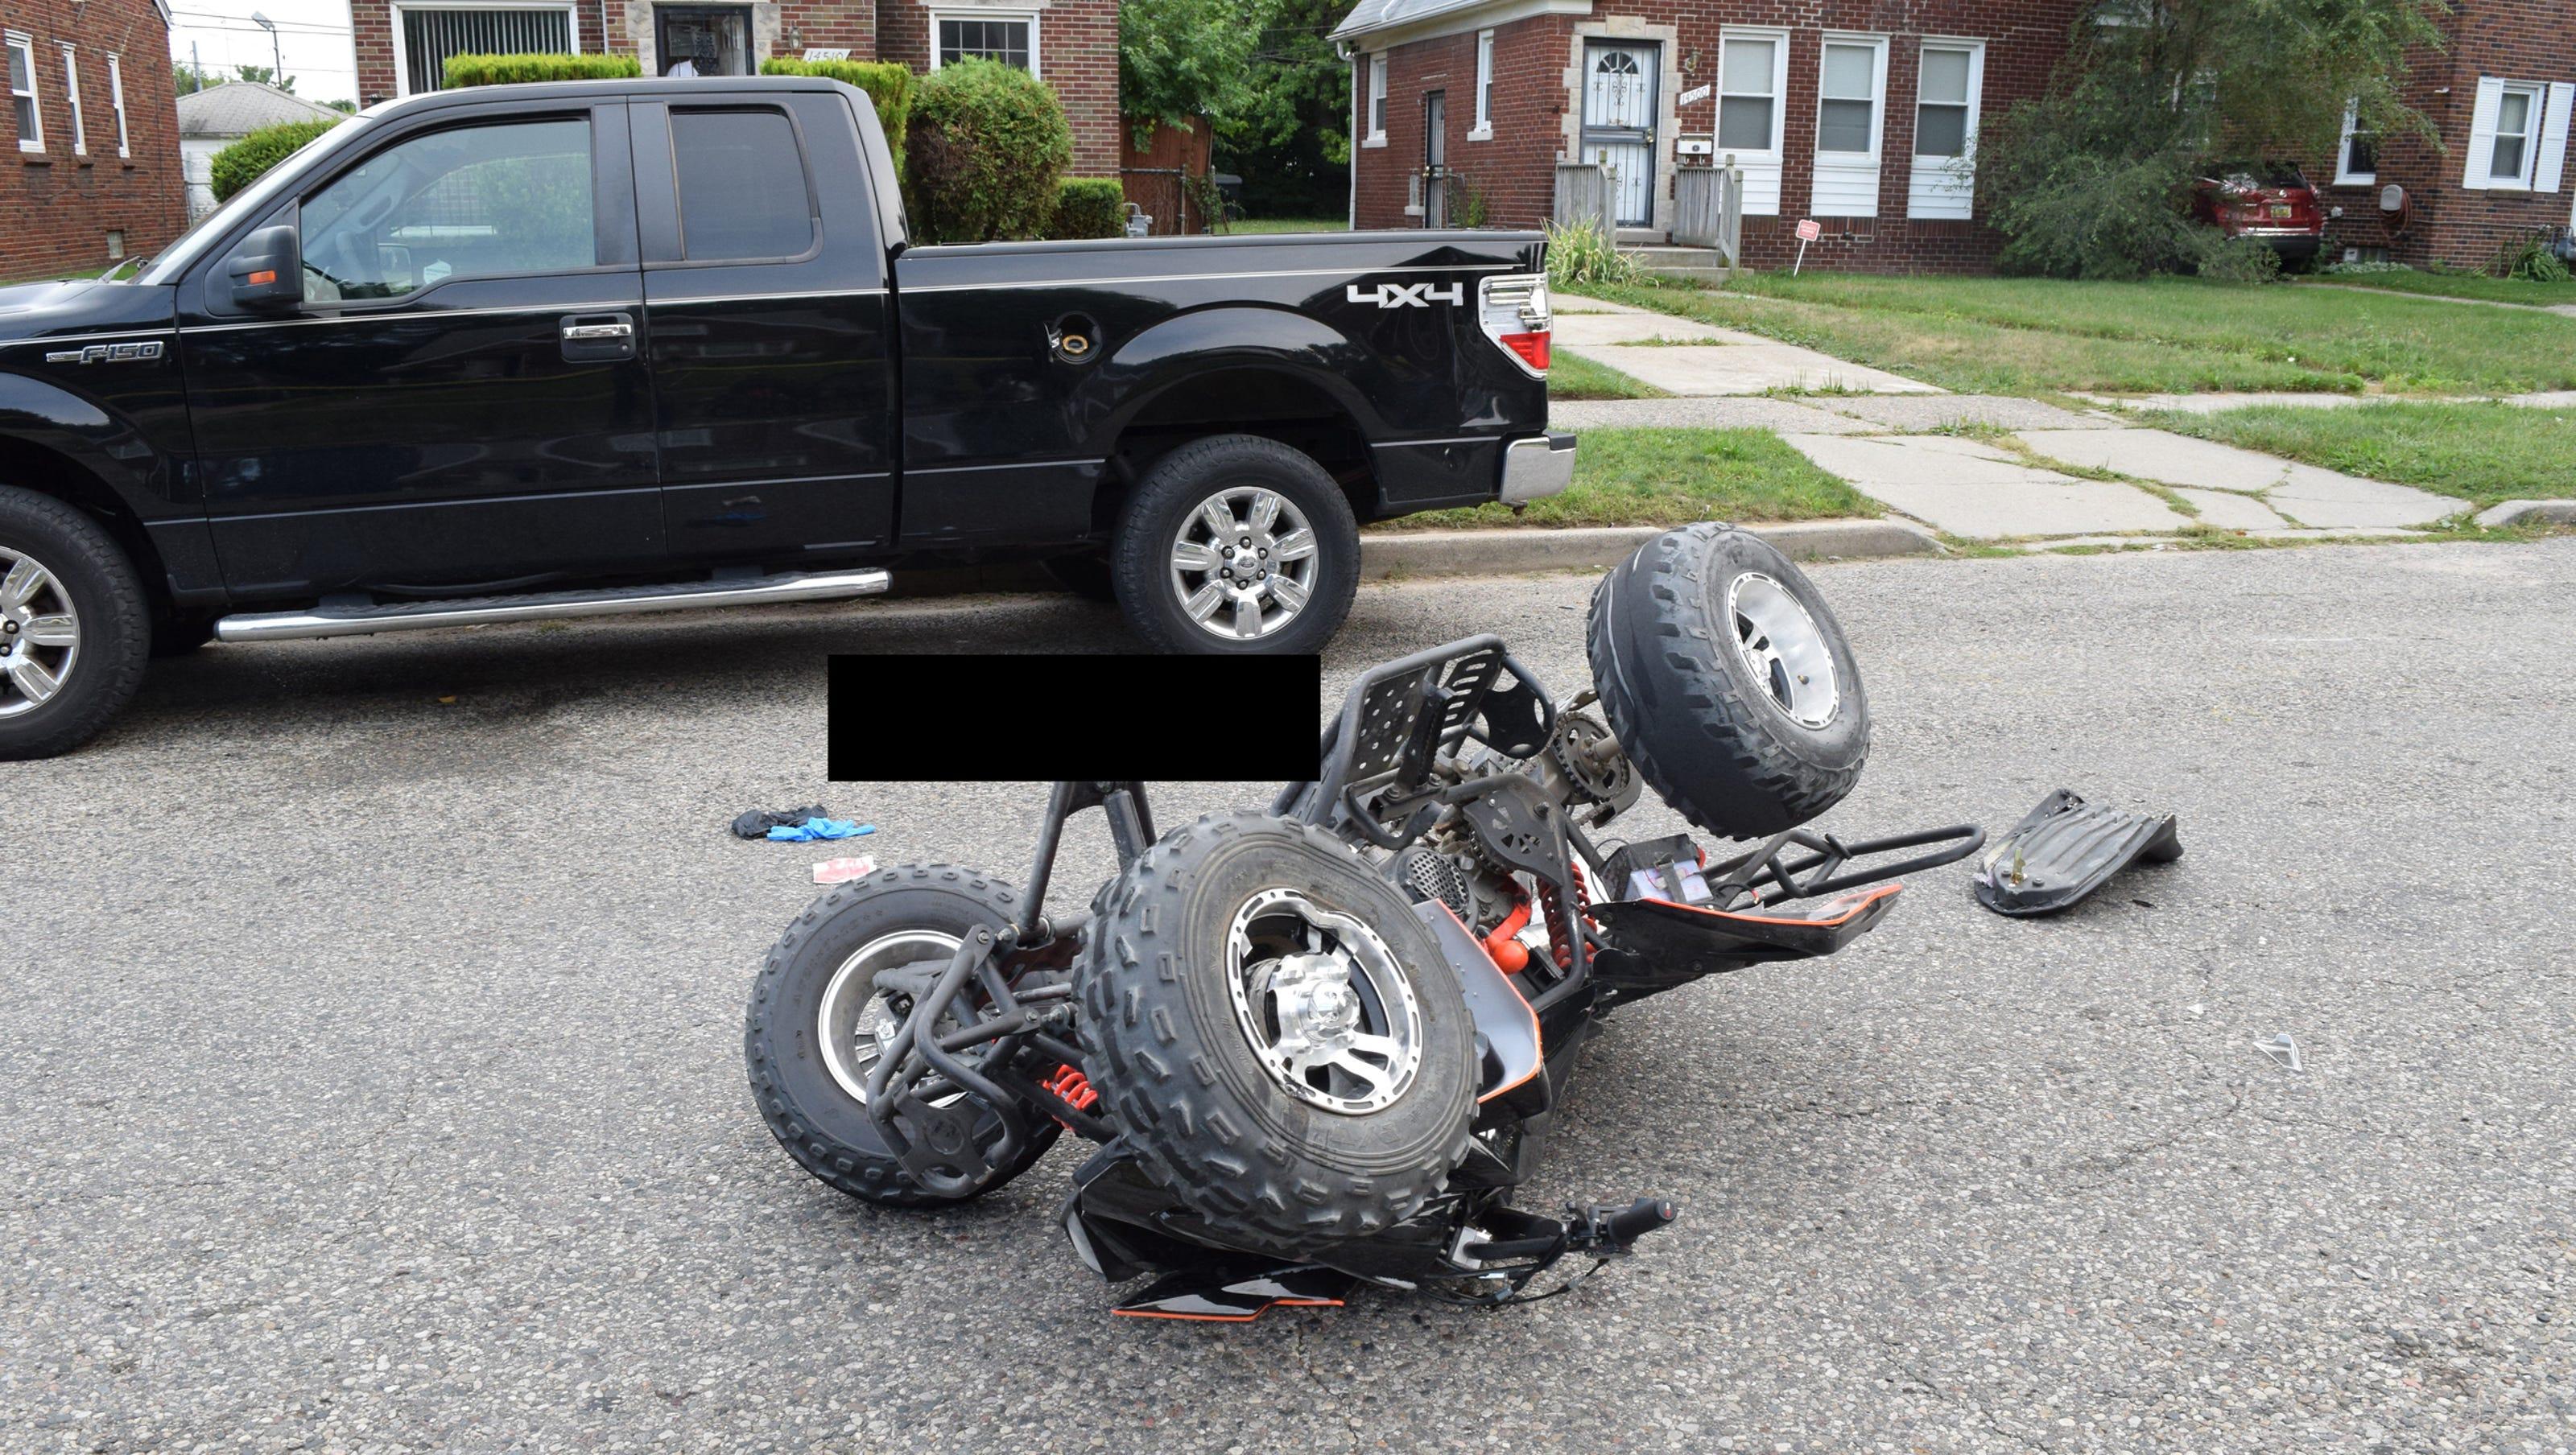 636591307835261642-ruck-atv-crash-scene